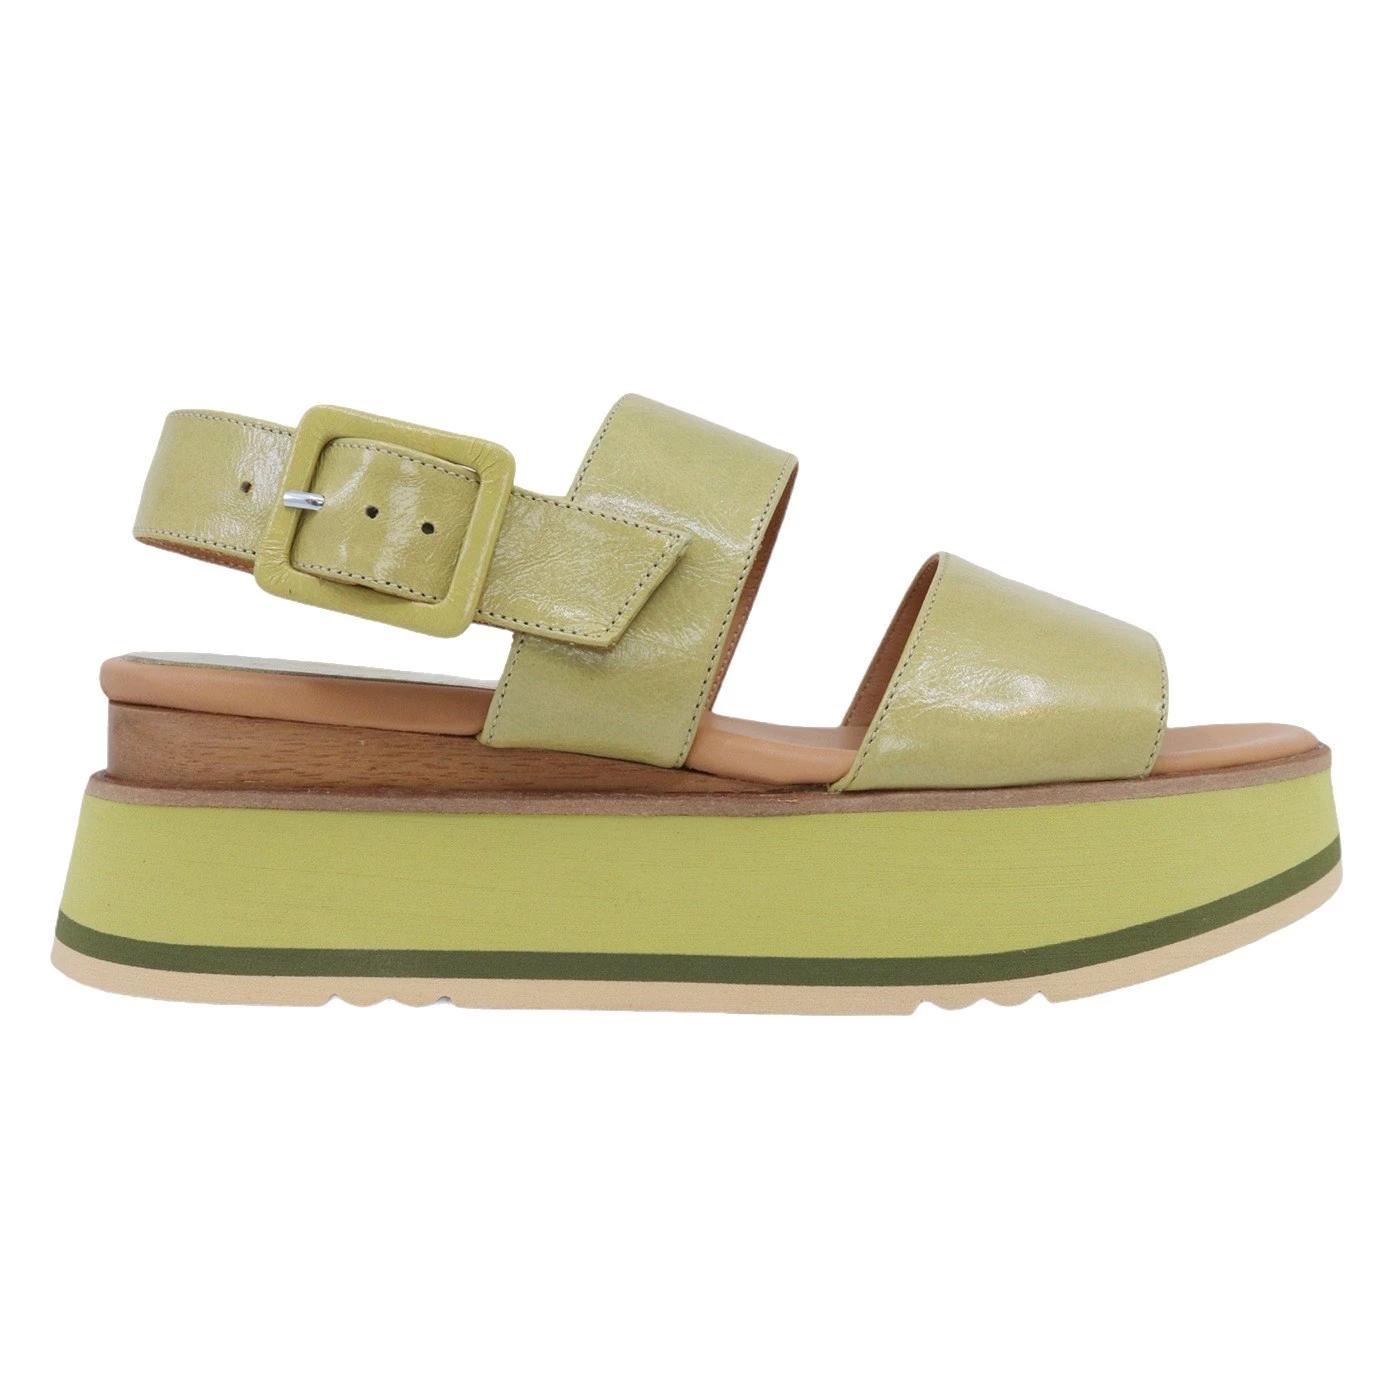 Paloma Barcelo Javari 2078 sandalo da donna in pelle verde